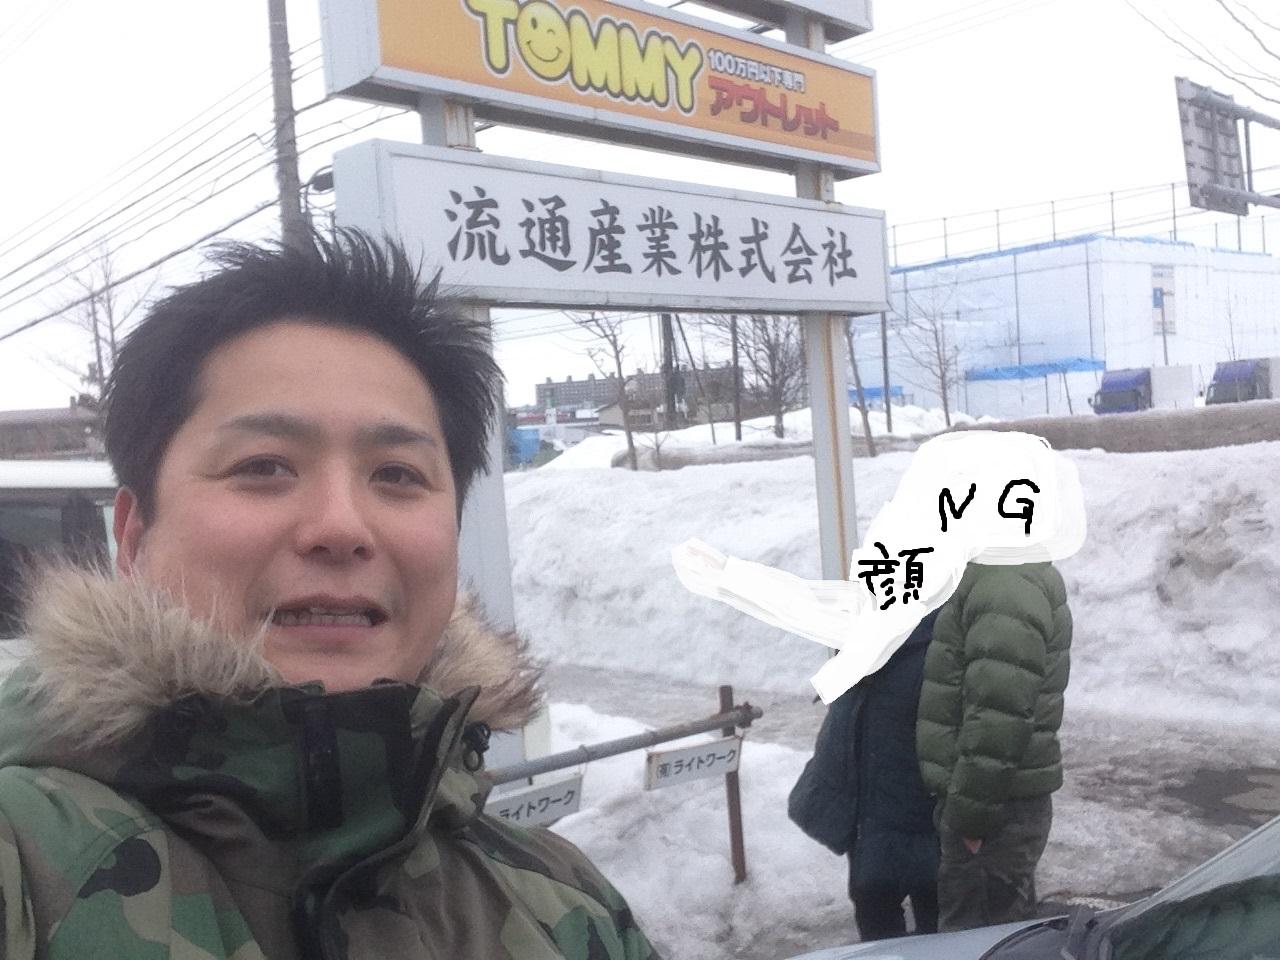 K様アルファード御成約☆キューブ☆タント☆ヴォクシー☆ステップワゴン☆ノア_b0127002_1723710.jpg